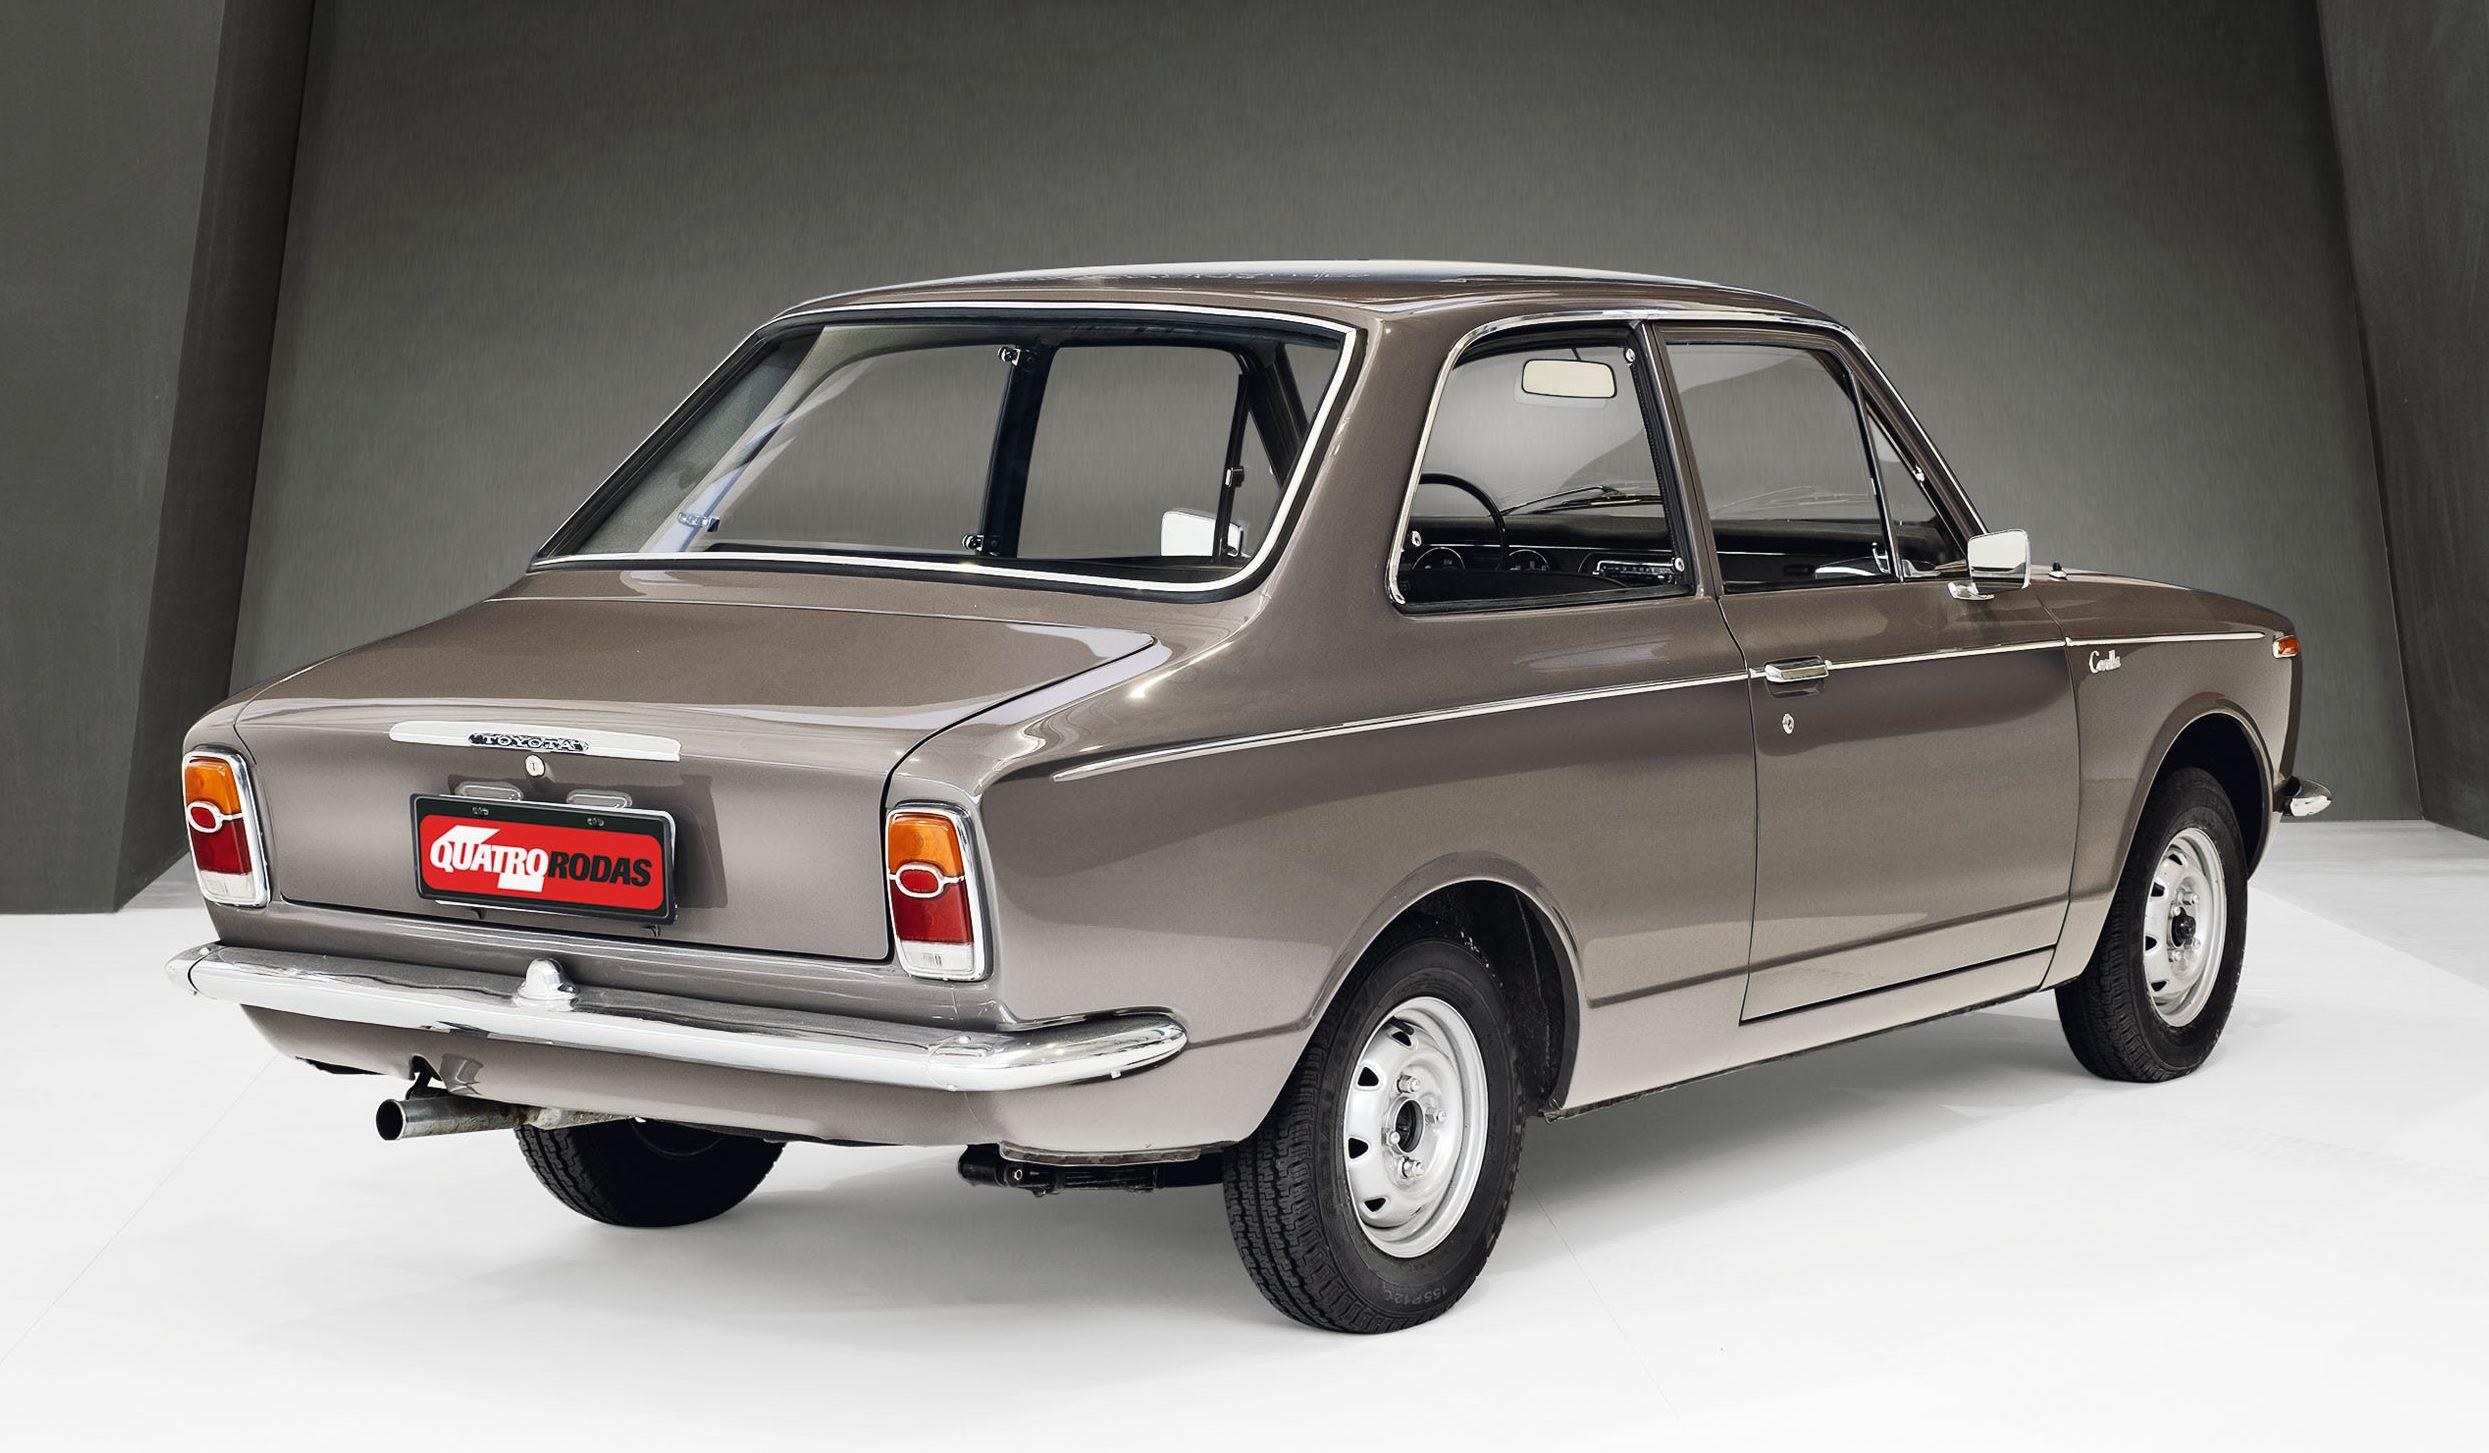 Toyota Corolla 1968 - clássicos QUATRO RODAS